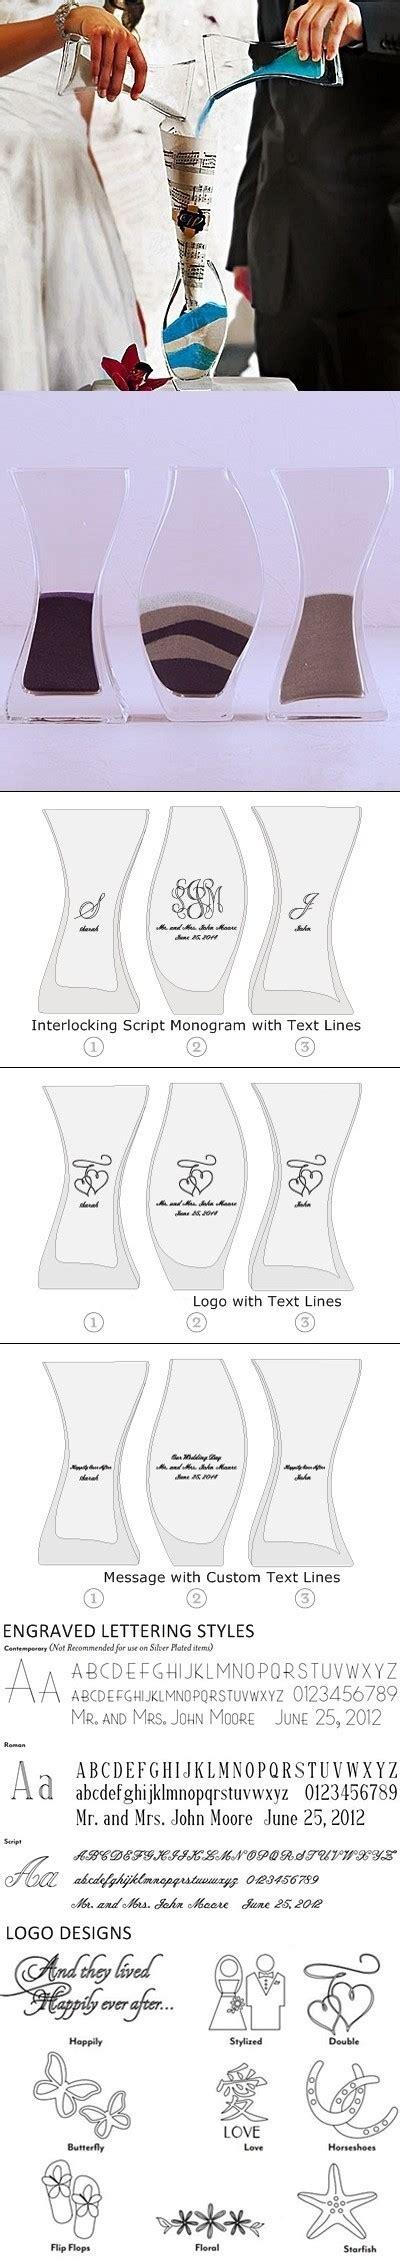 unity nested layout weddingstar customized unity sand ceremony nesting 3 piece